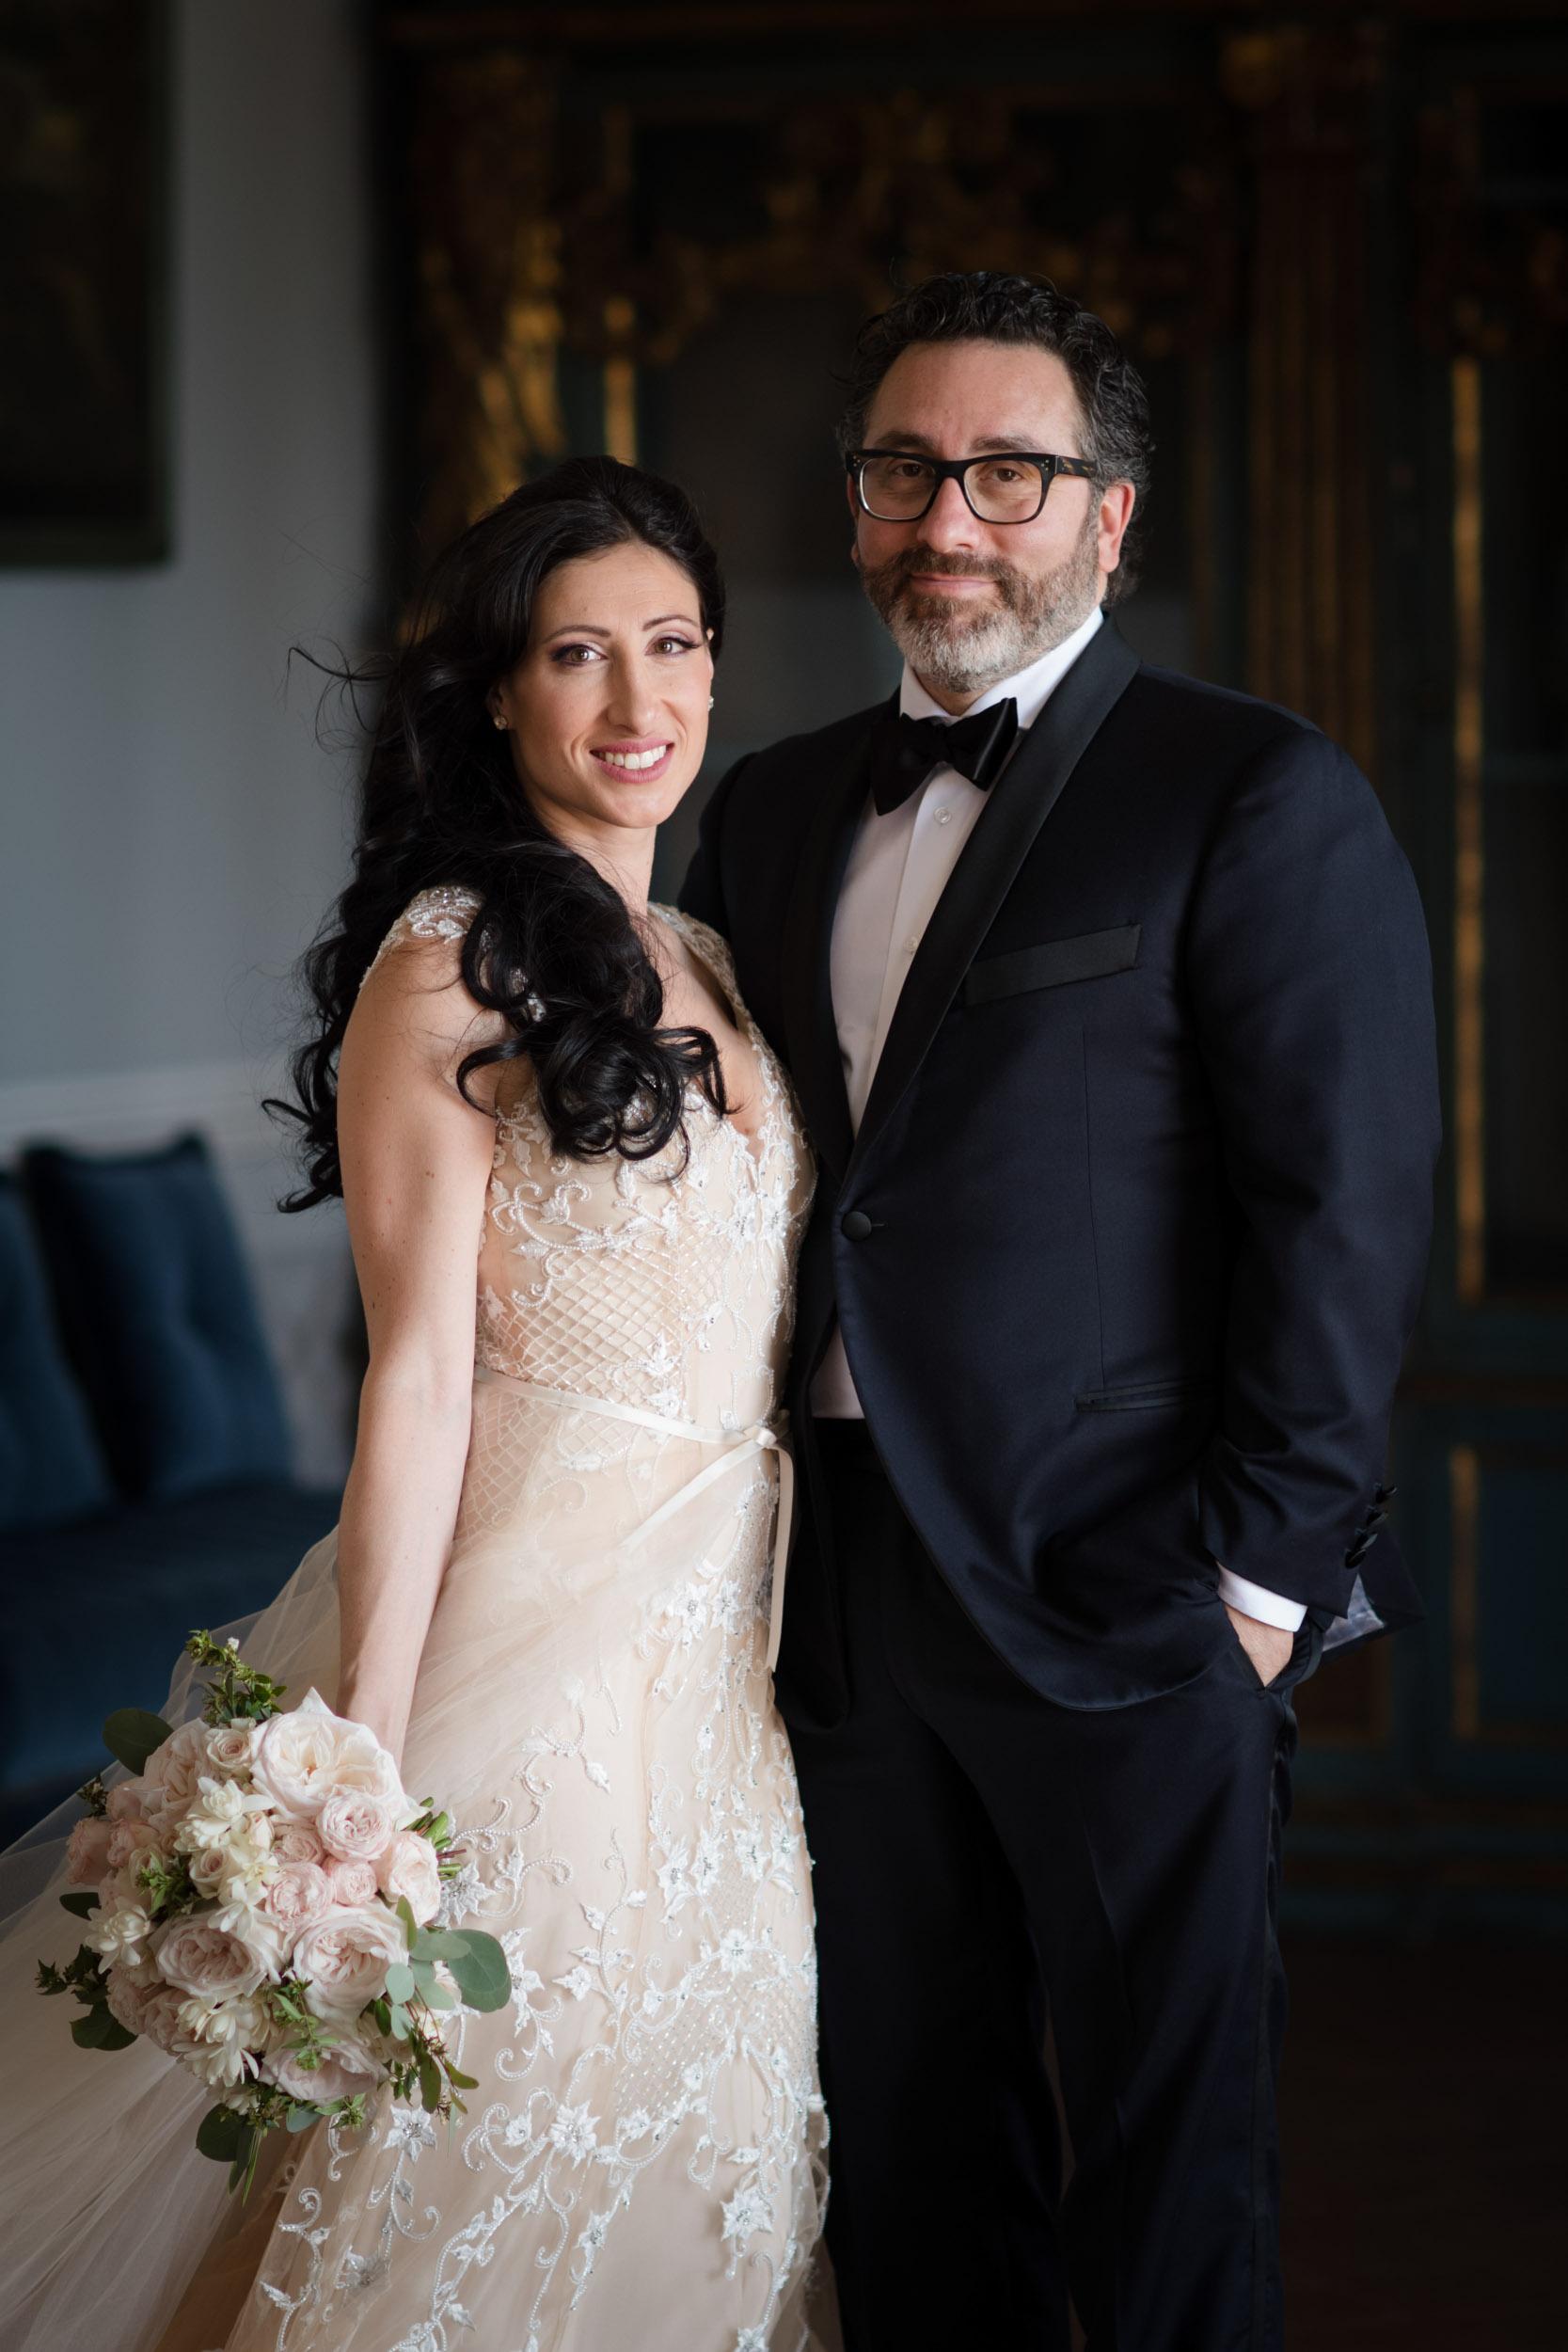 villa-gamberaia-florence-italy-destination-wedding-28.jpg